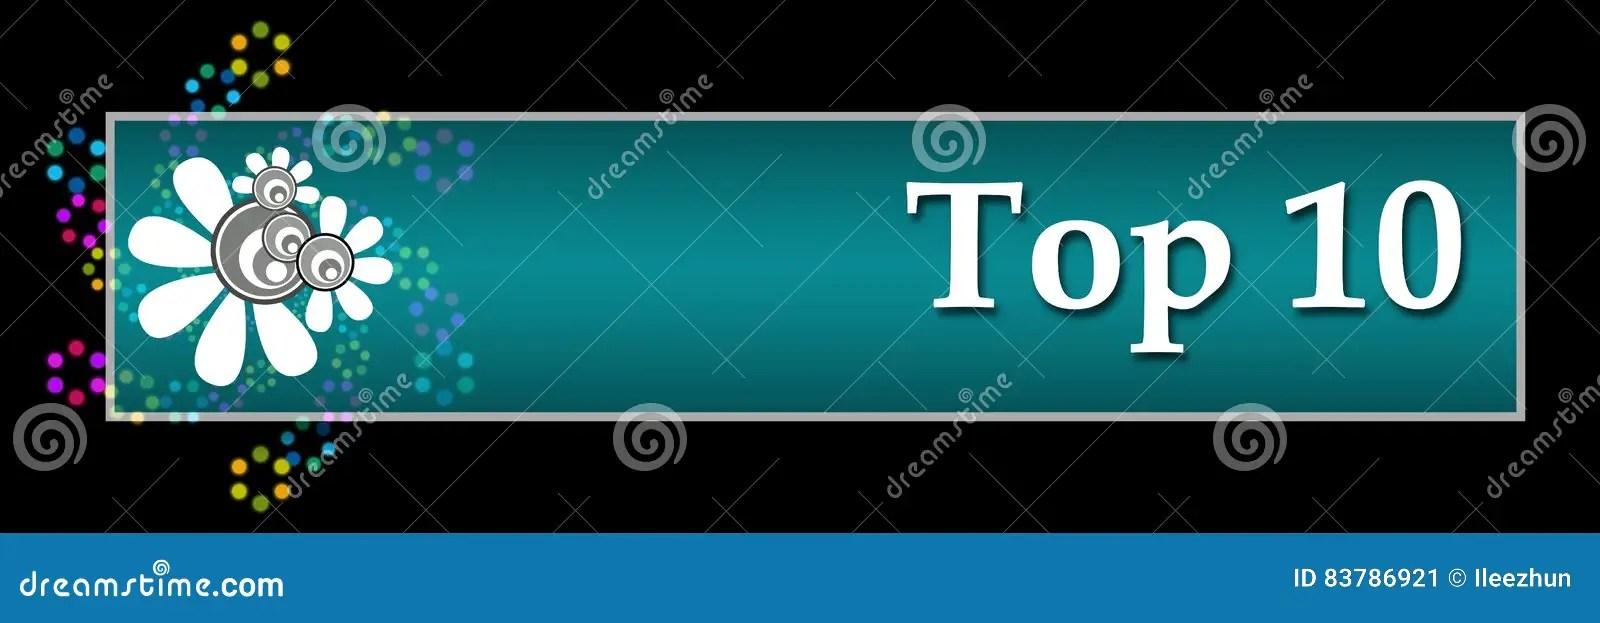 Top Ten Dark Colorful Neon Horizontal Stock Illustration - words for achievement